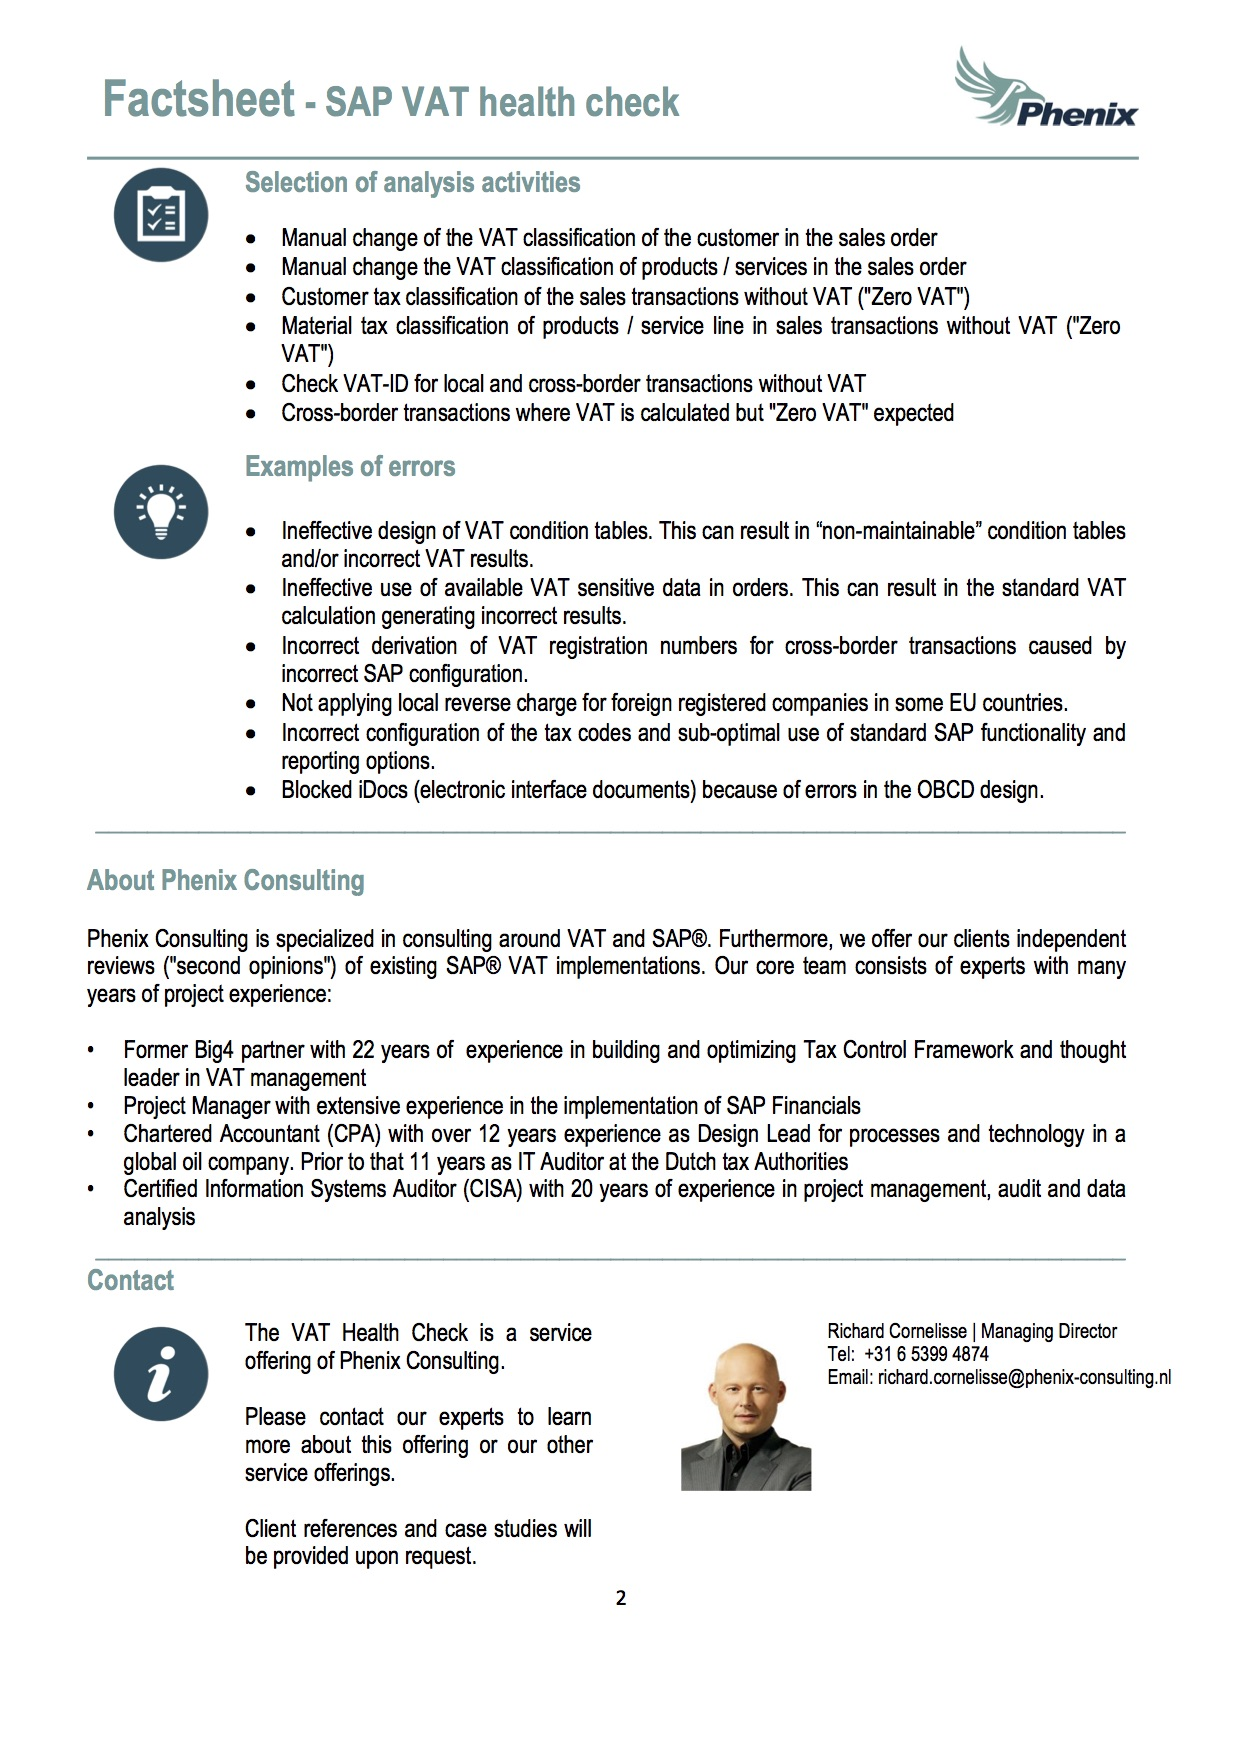 Vat Manual Diagram Of All Years Gc160 Pha Honda Small Engine Camshaft And Array Sap Health Check U2013 Control Framework Rh Vatautomation Wordpress